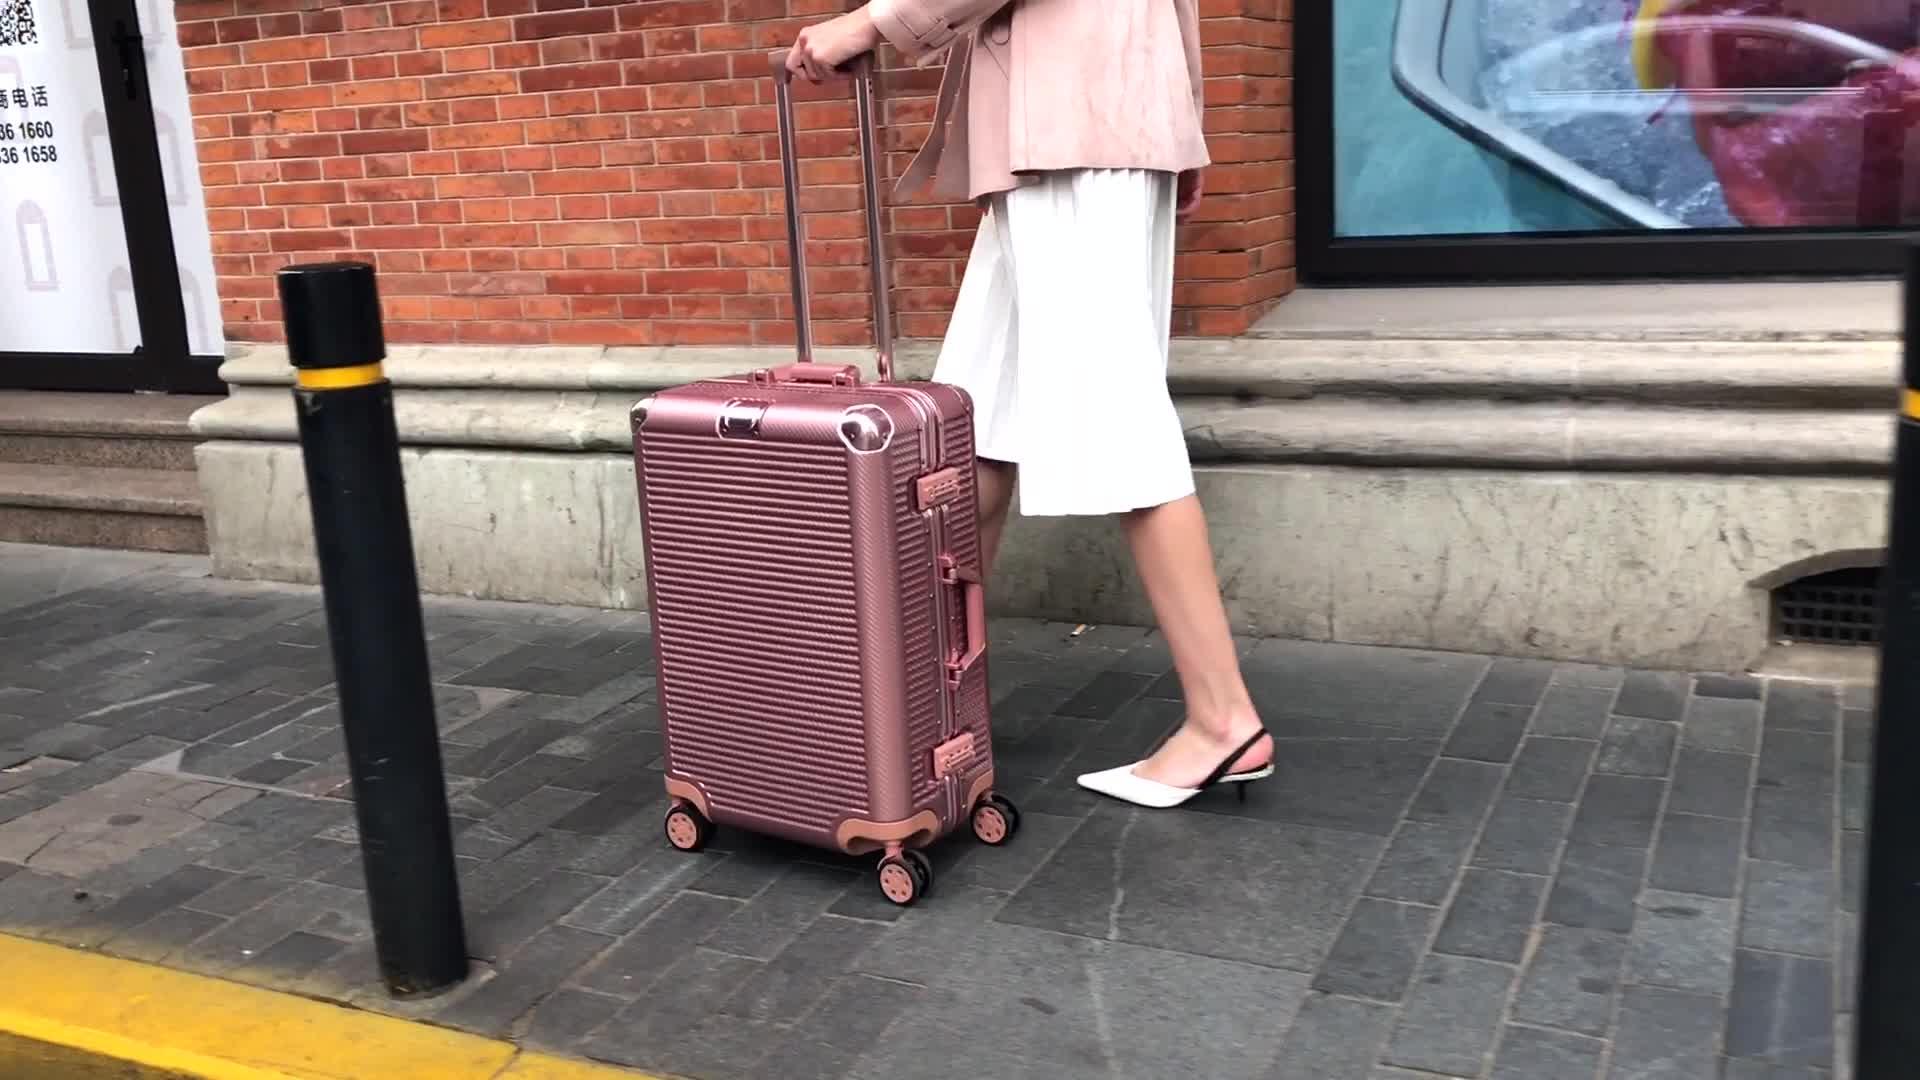 Krawatte Stange Ist Fest Polycarbonat Stahl Koffer Präsident Koffer Gepäck